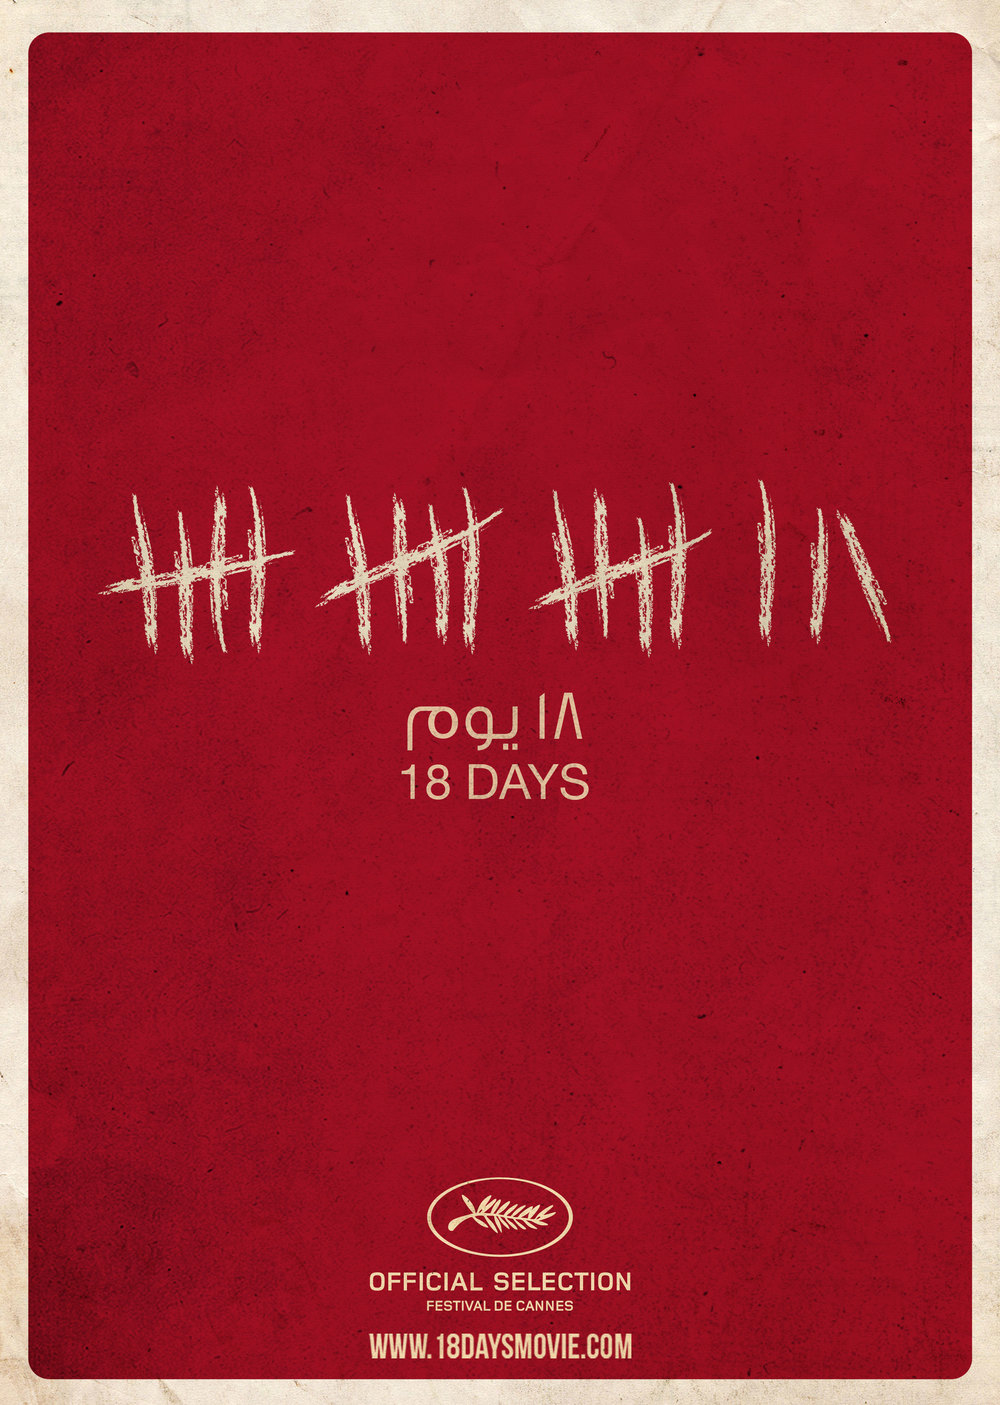 18 DAYS 2011